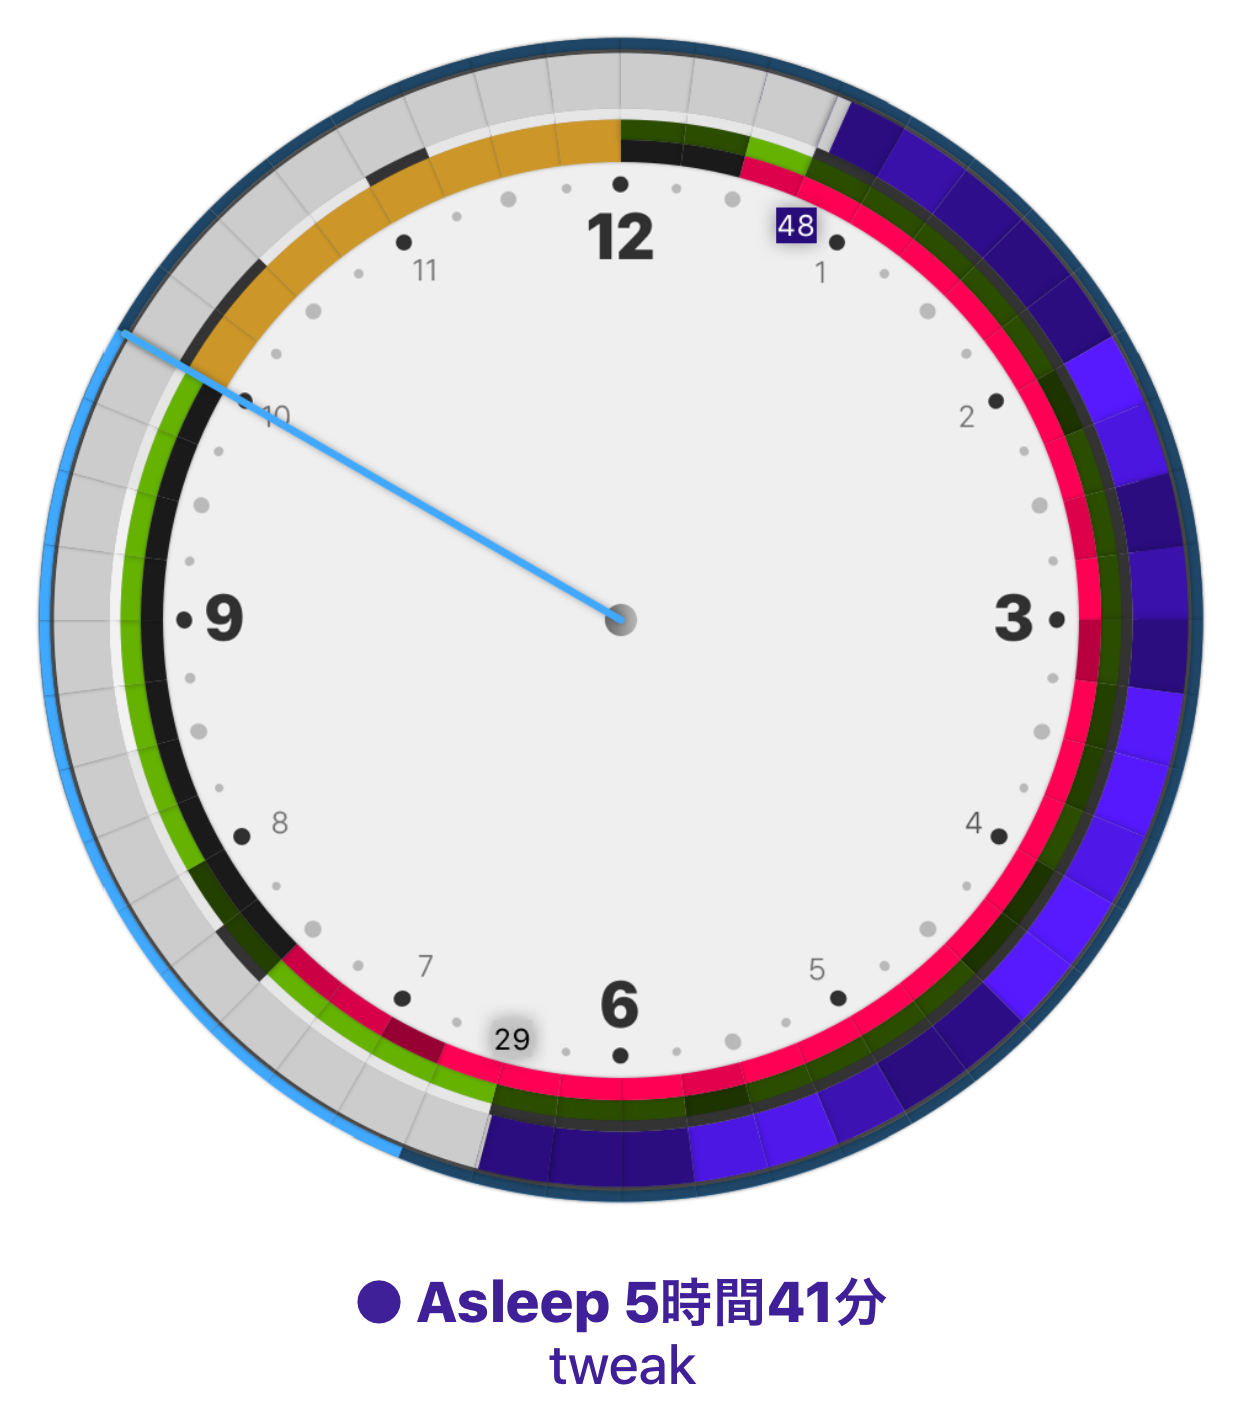 AppleWatchを利用した完全自動の睡眠分析アプリ「AutoSleep」がスゴい!